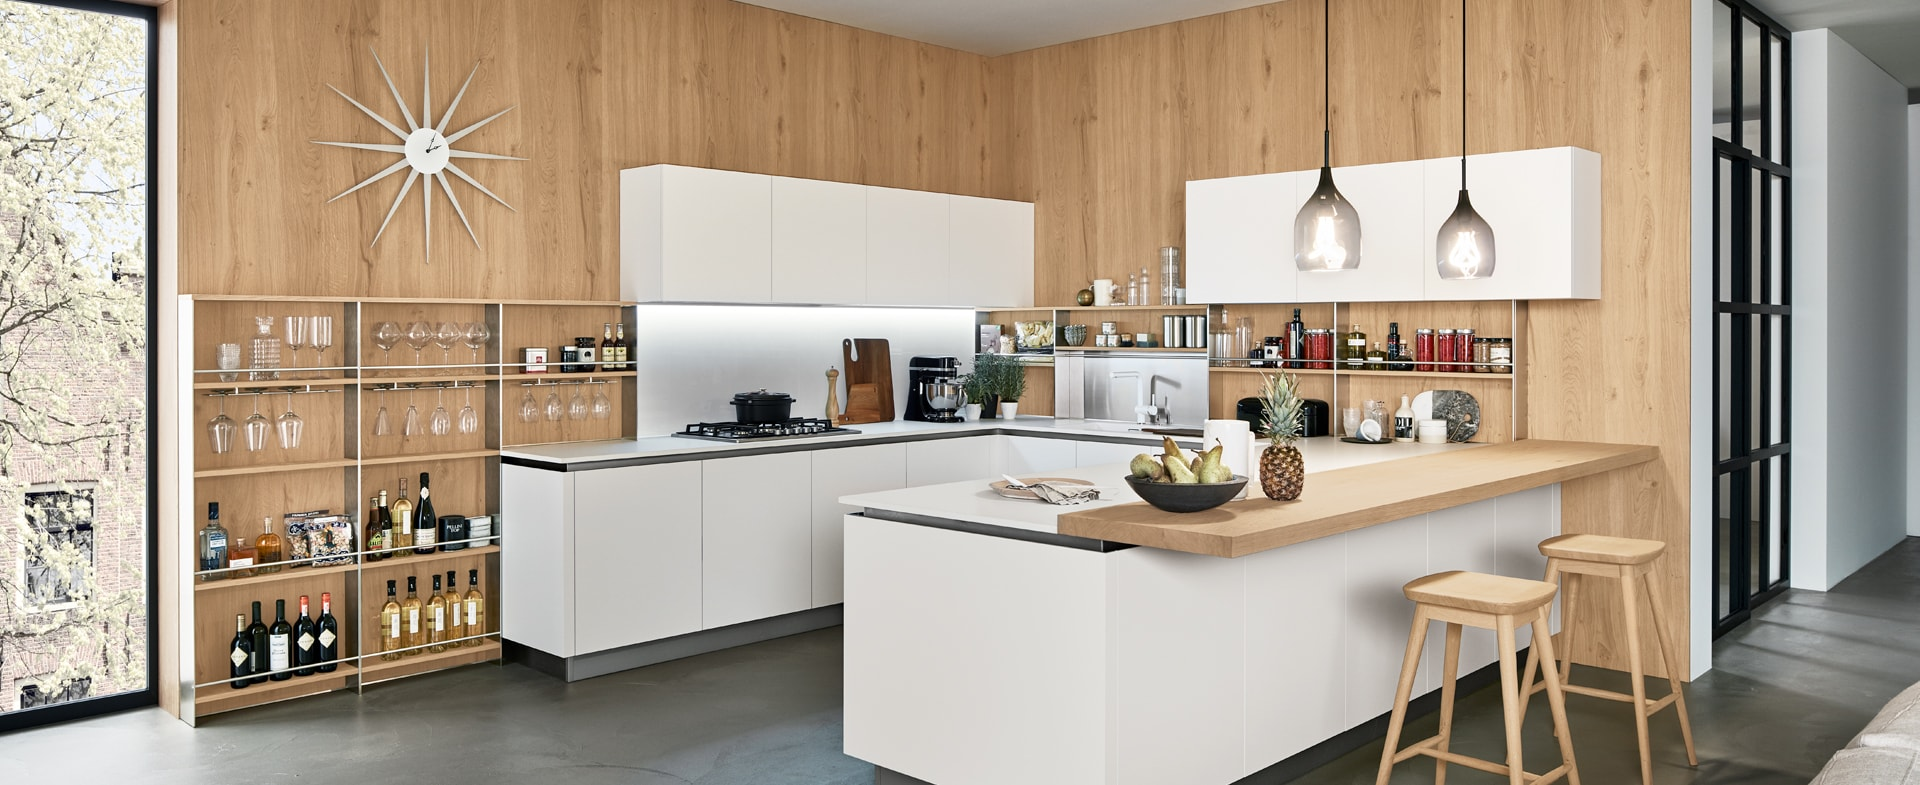 Ilot Central Petite Cuisine cuisine design avec îlot, cuisine avec îlot central et table